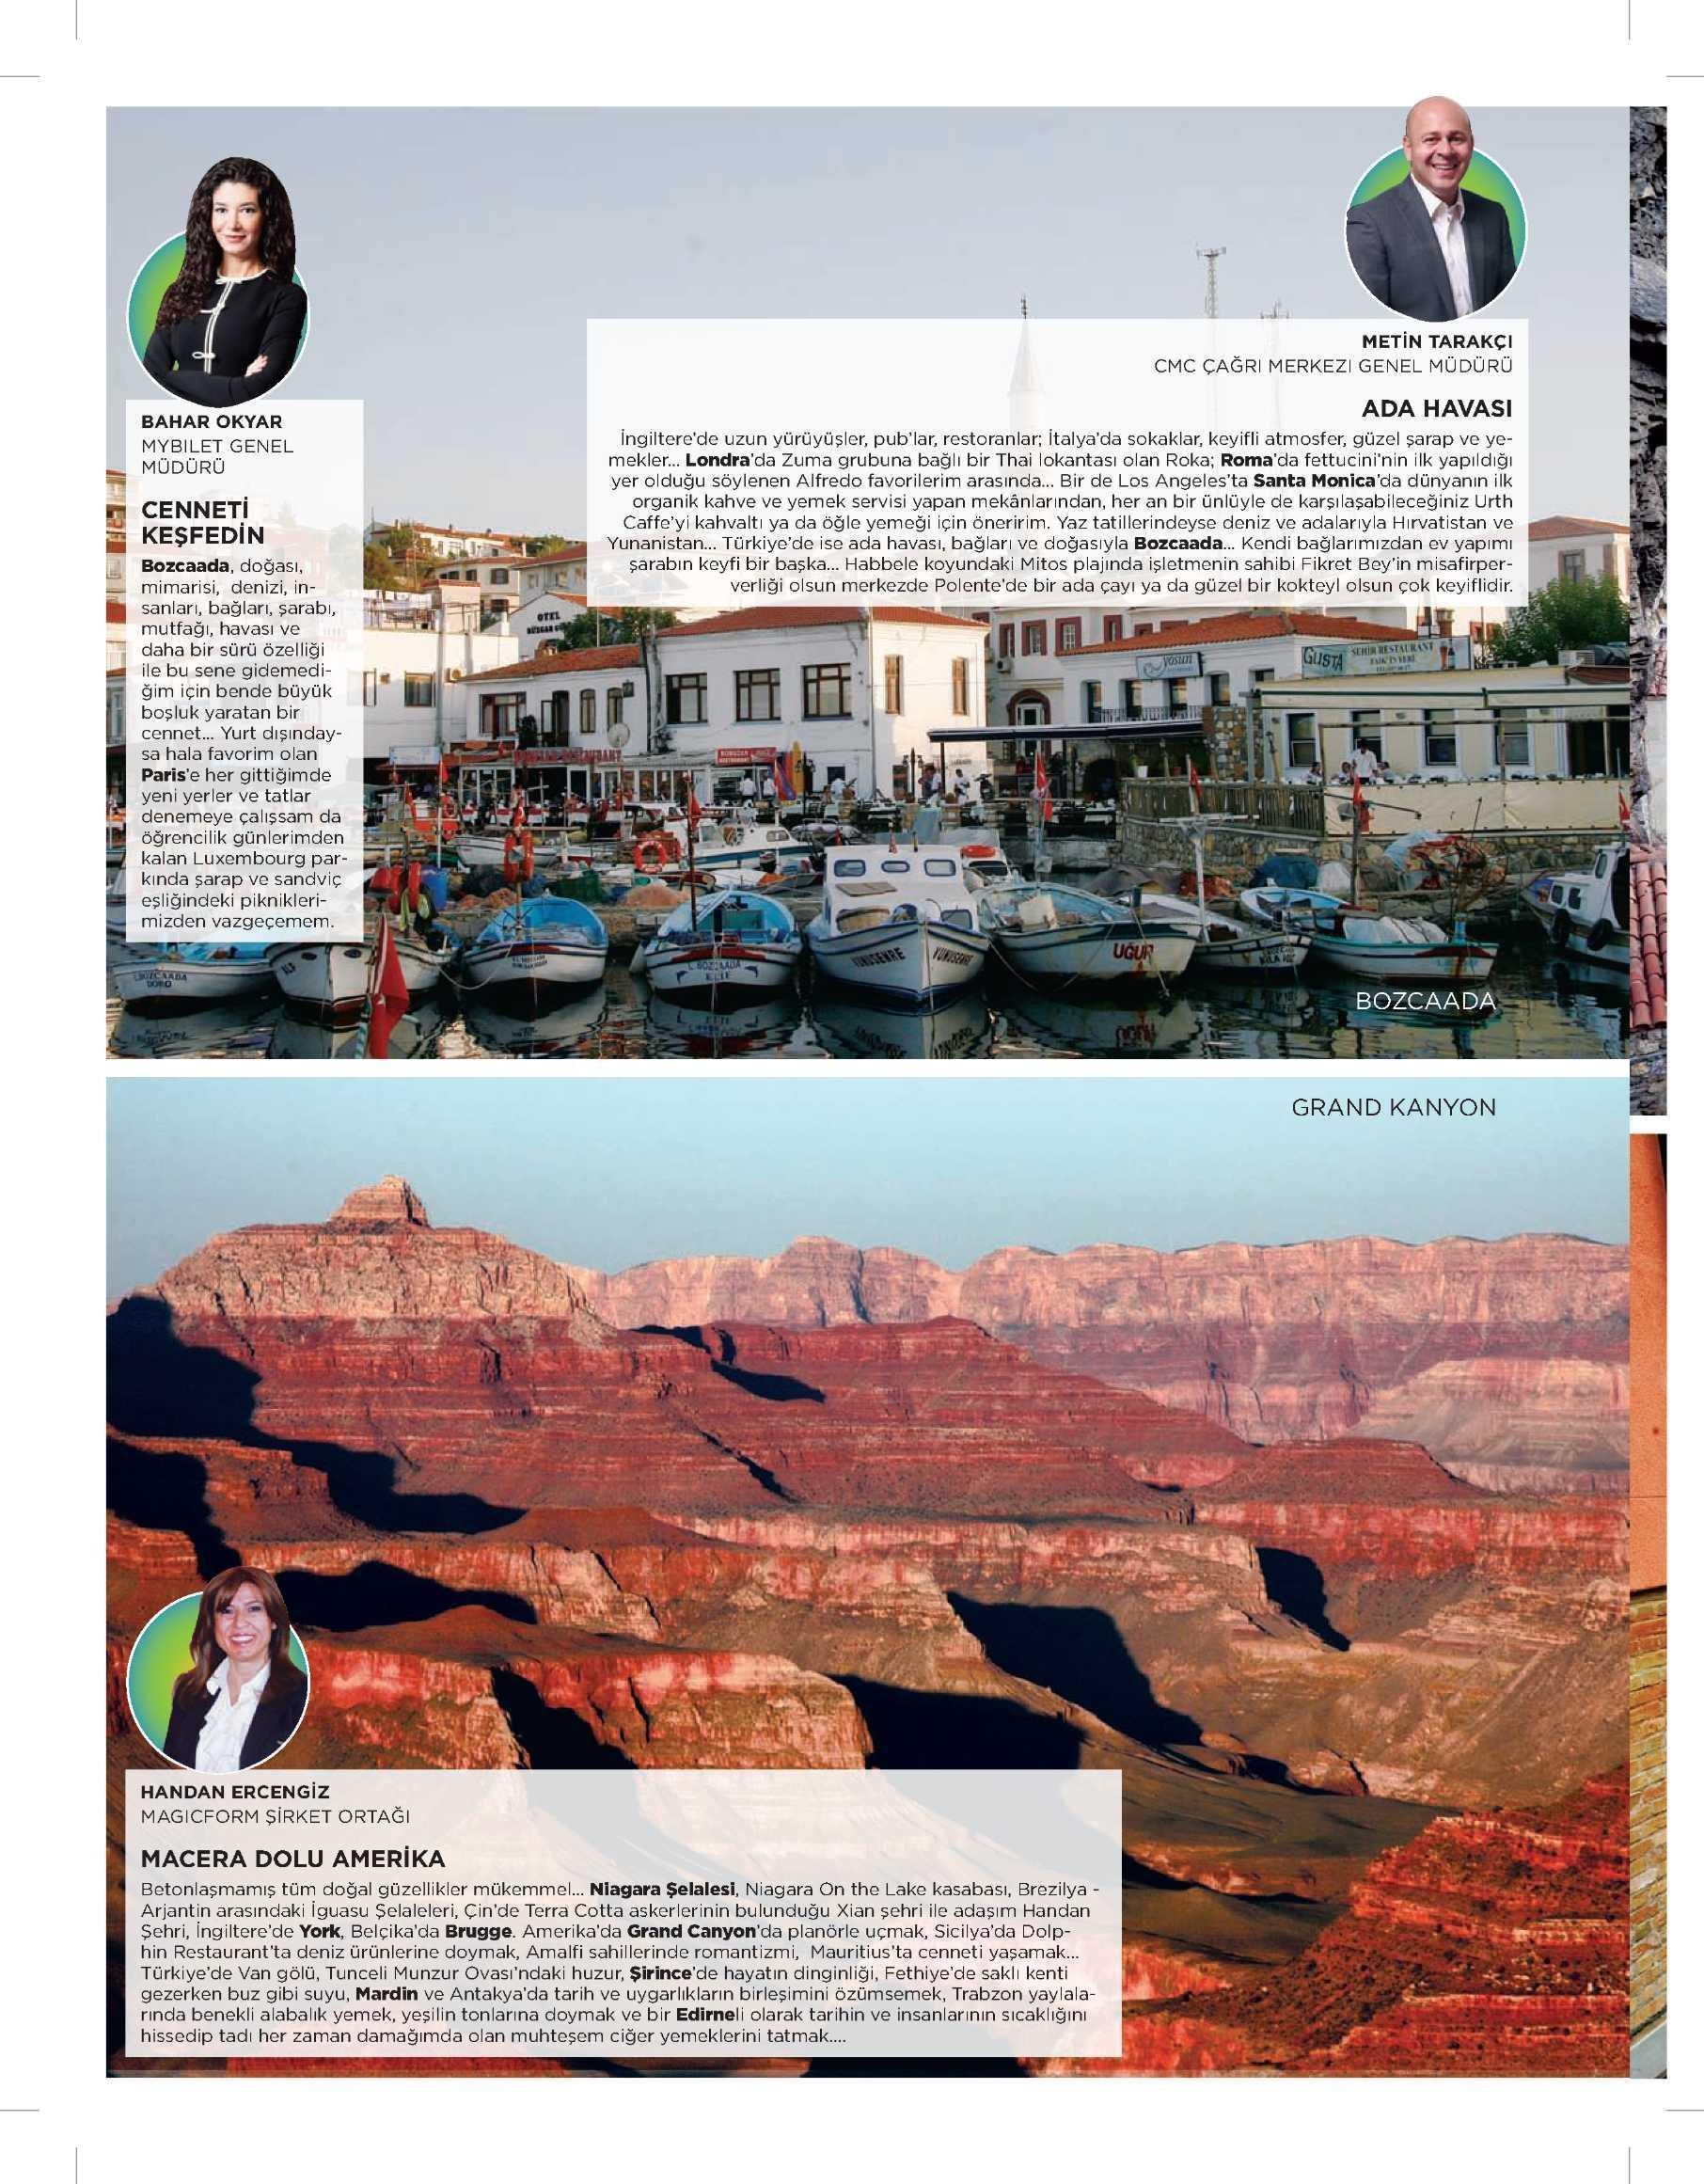 Netmarble-Turkey-Infomag-Dergisi-Aralik-2012-Sayfa-140-6